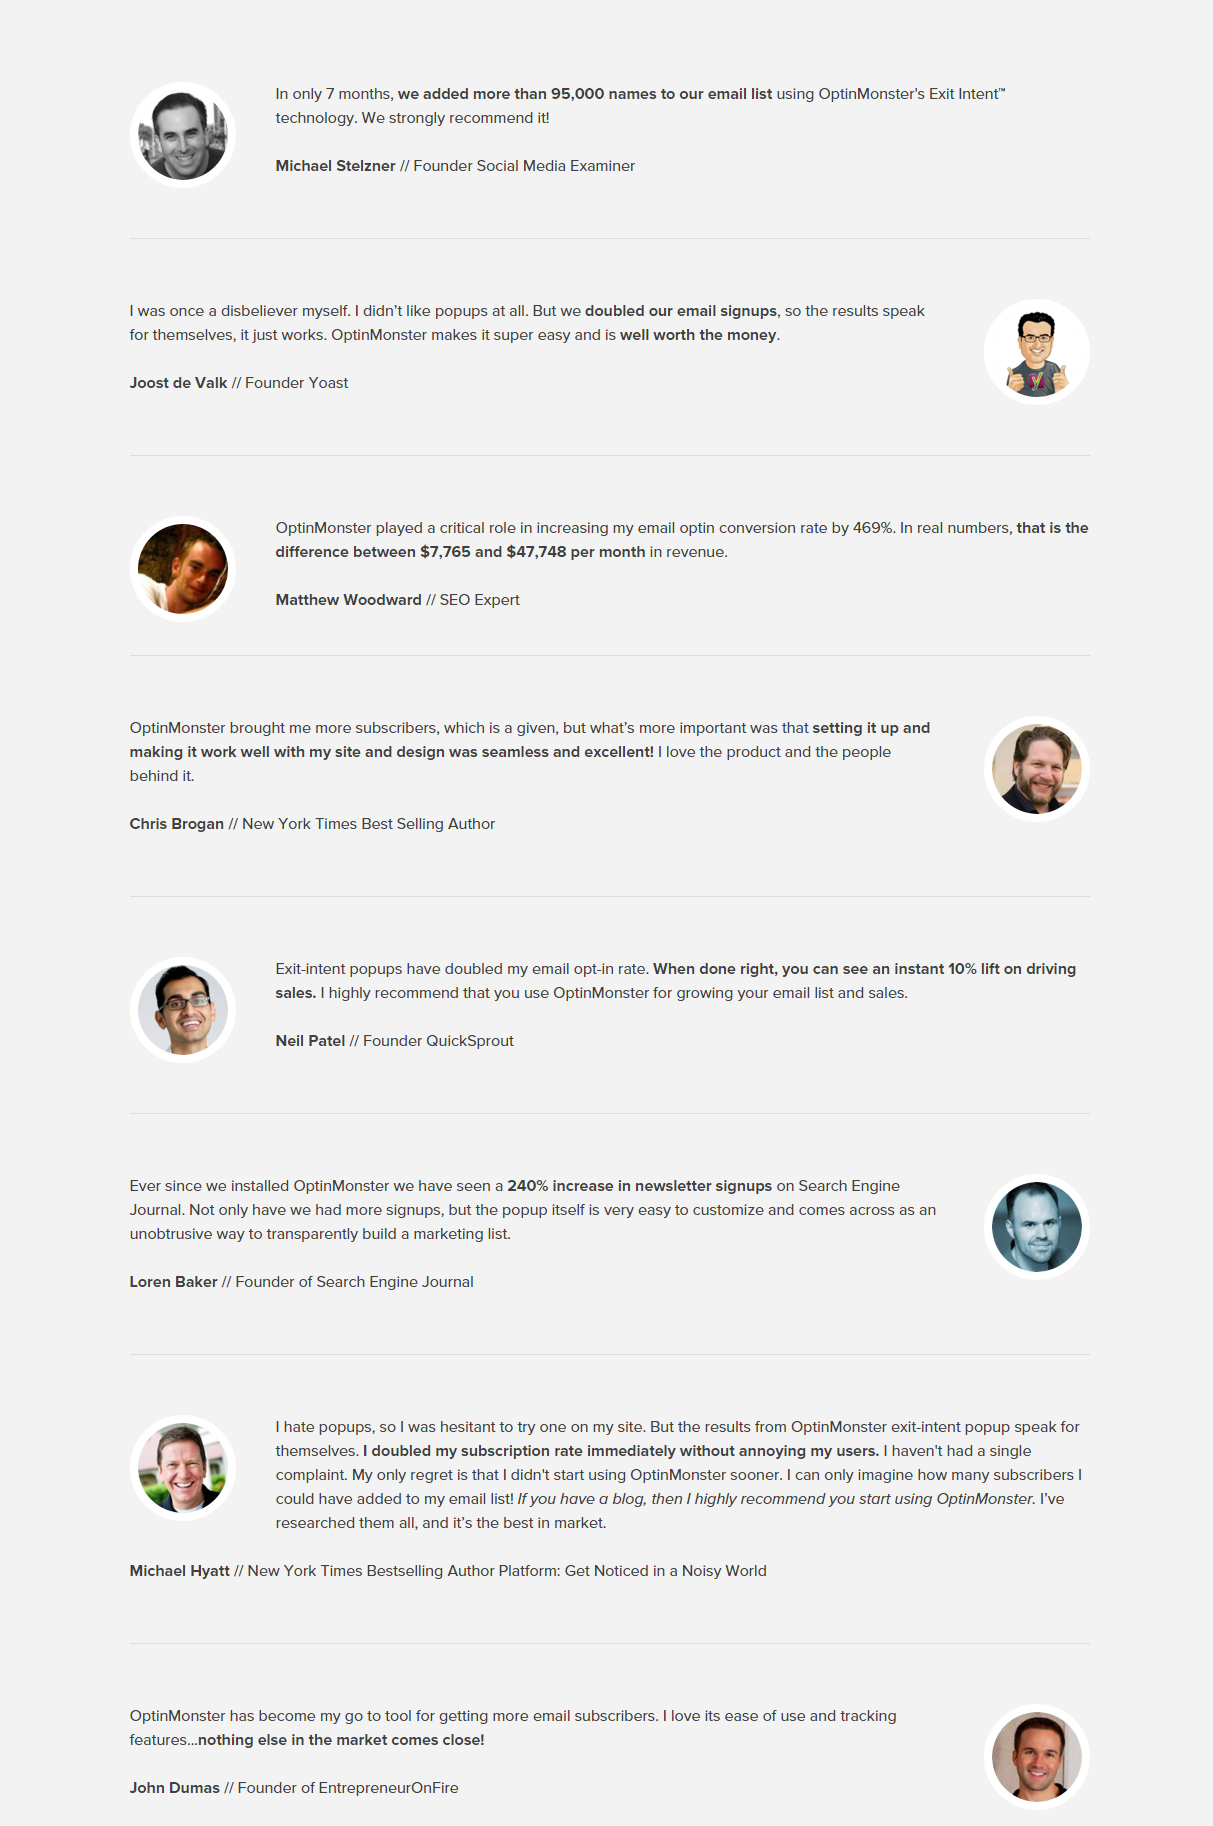 OptinMonster Customer Reviews Testimonials